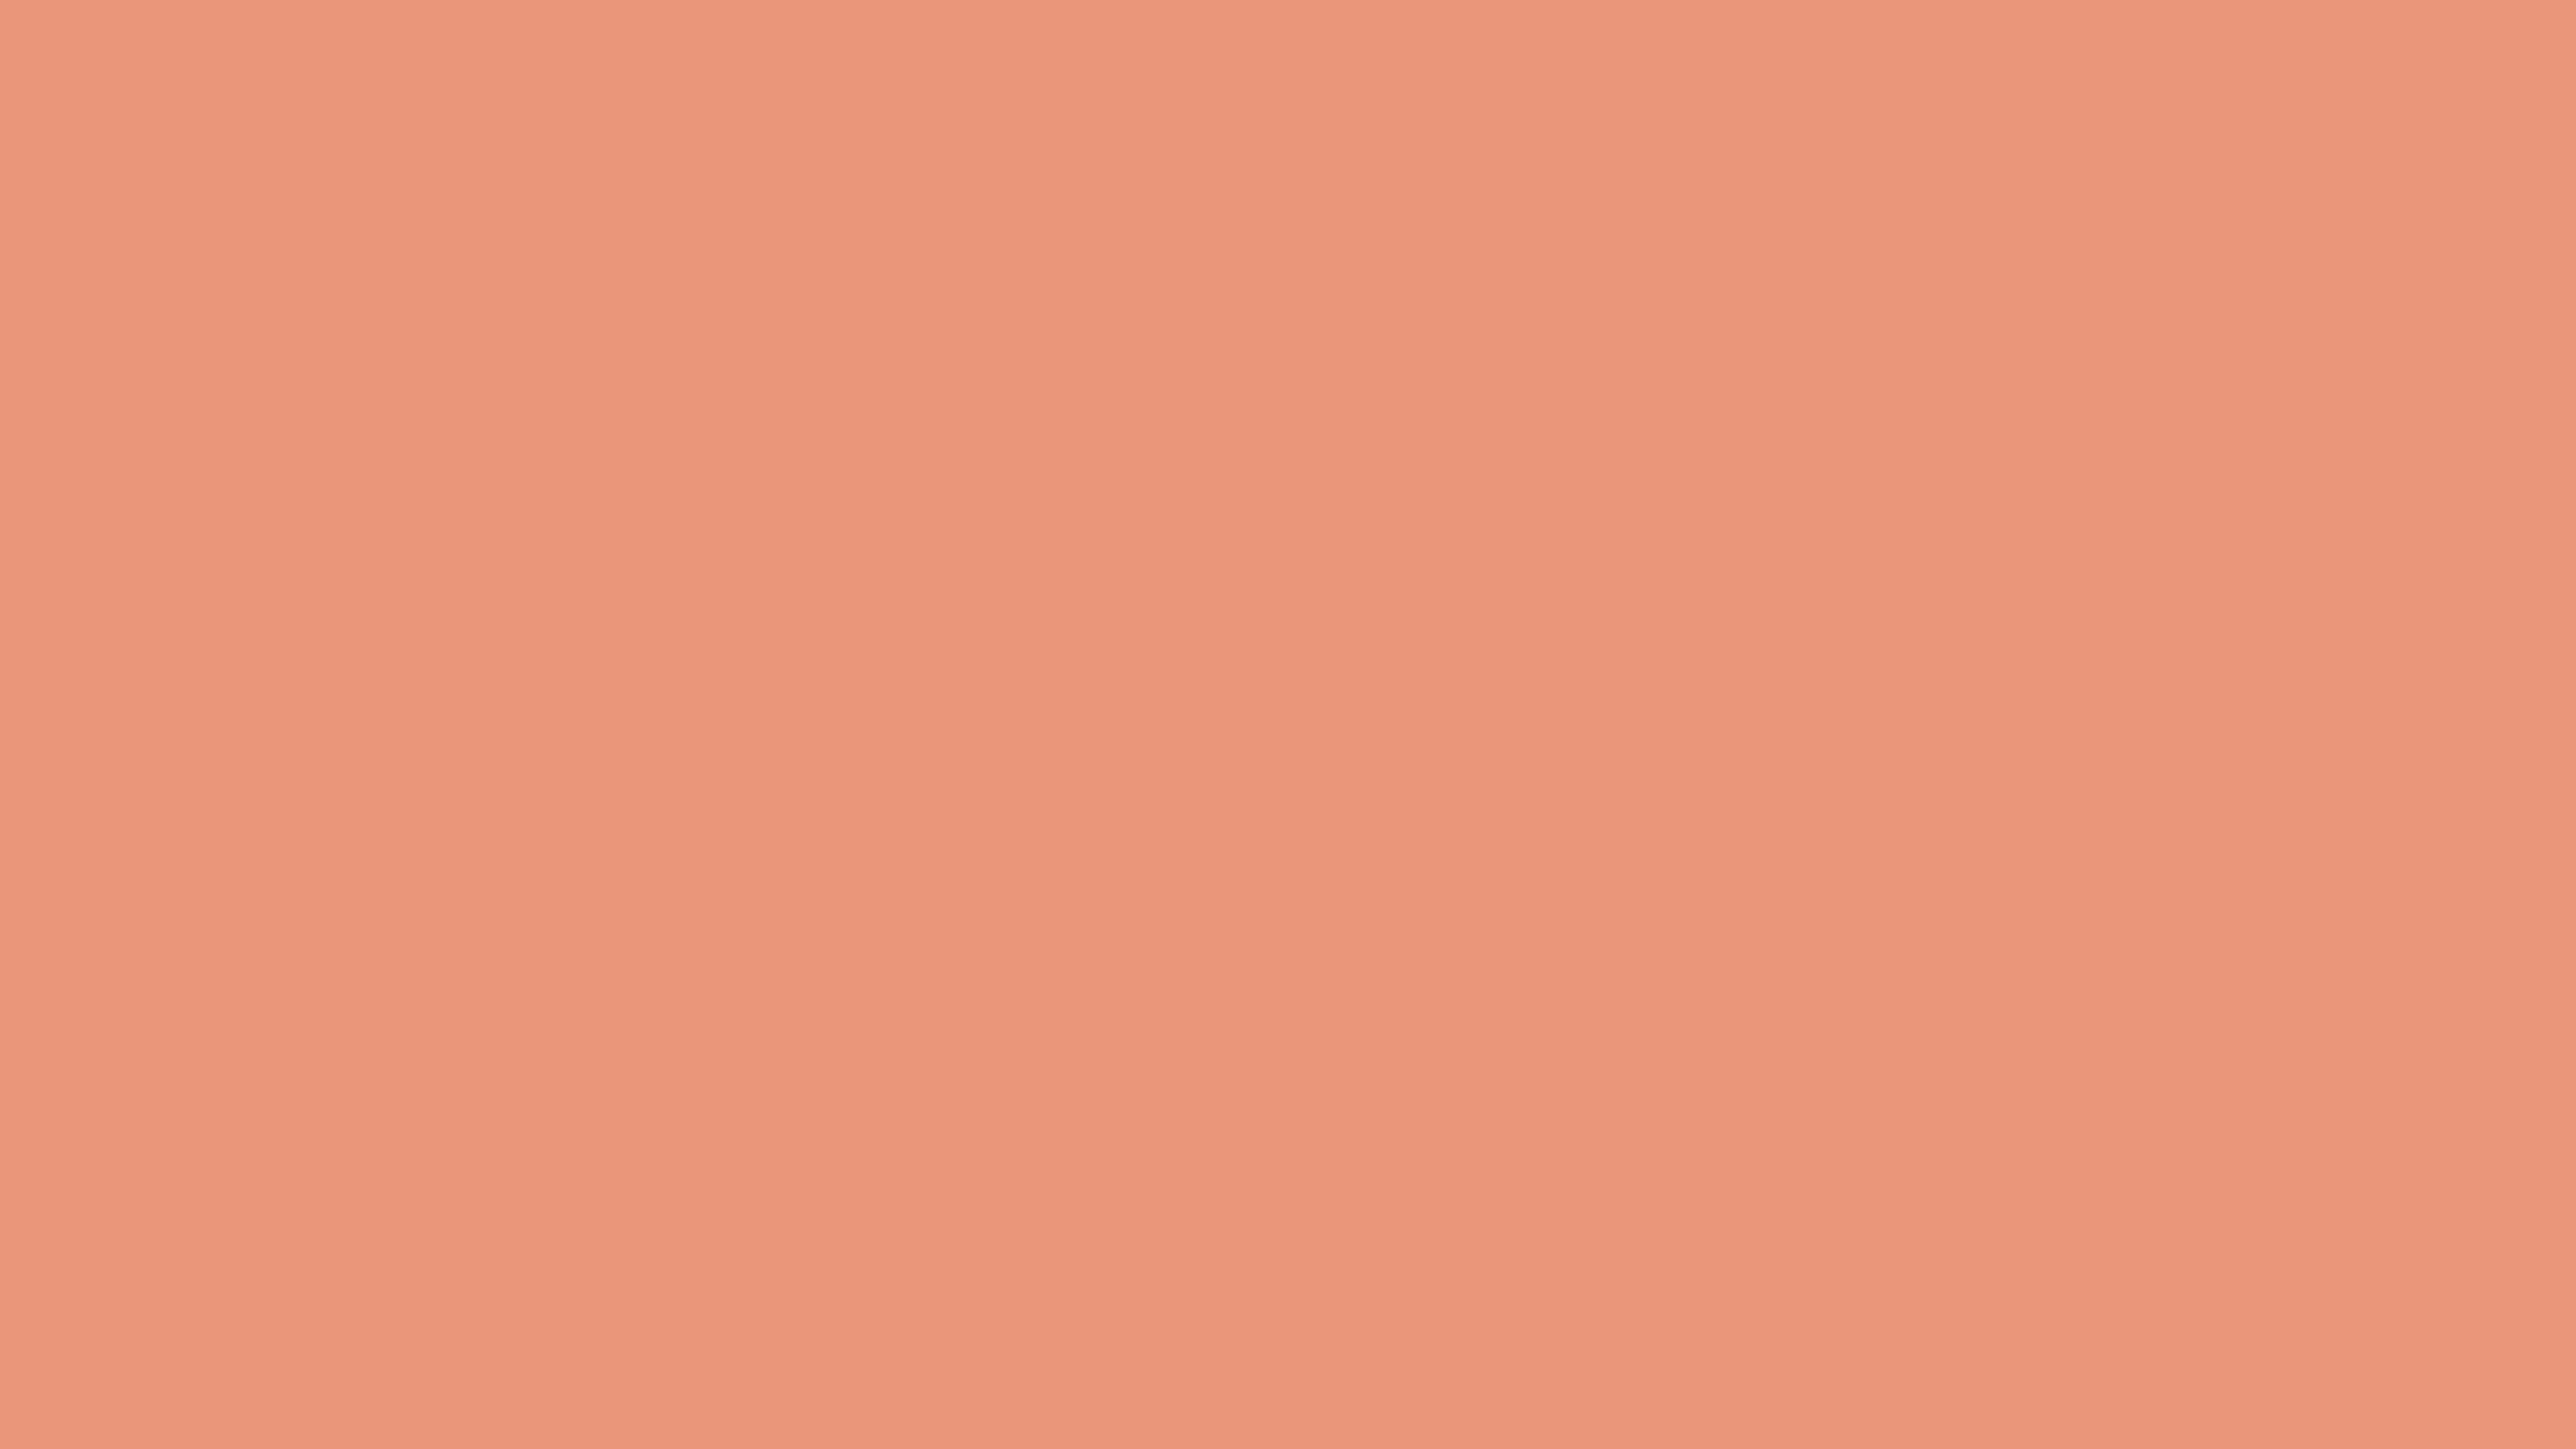 5120x2880 Dark Salmon Solid Color Background